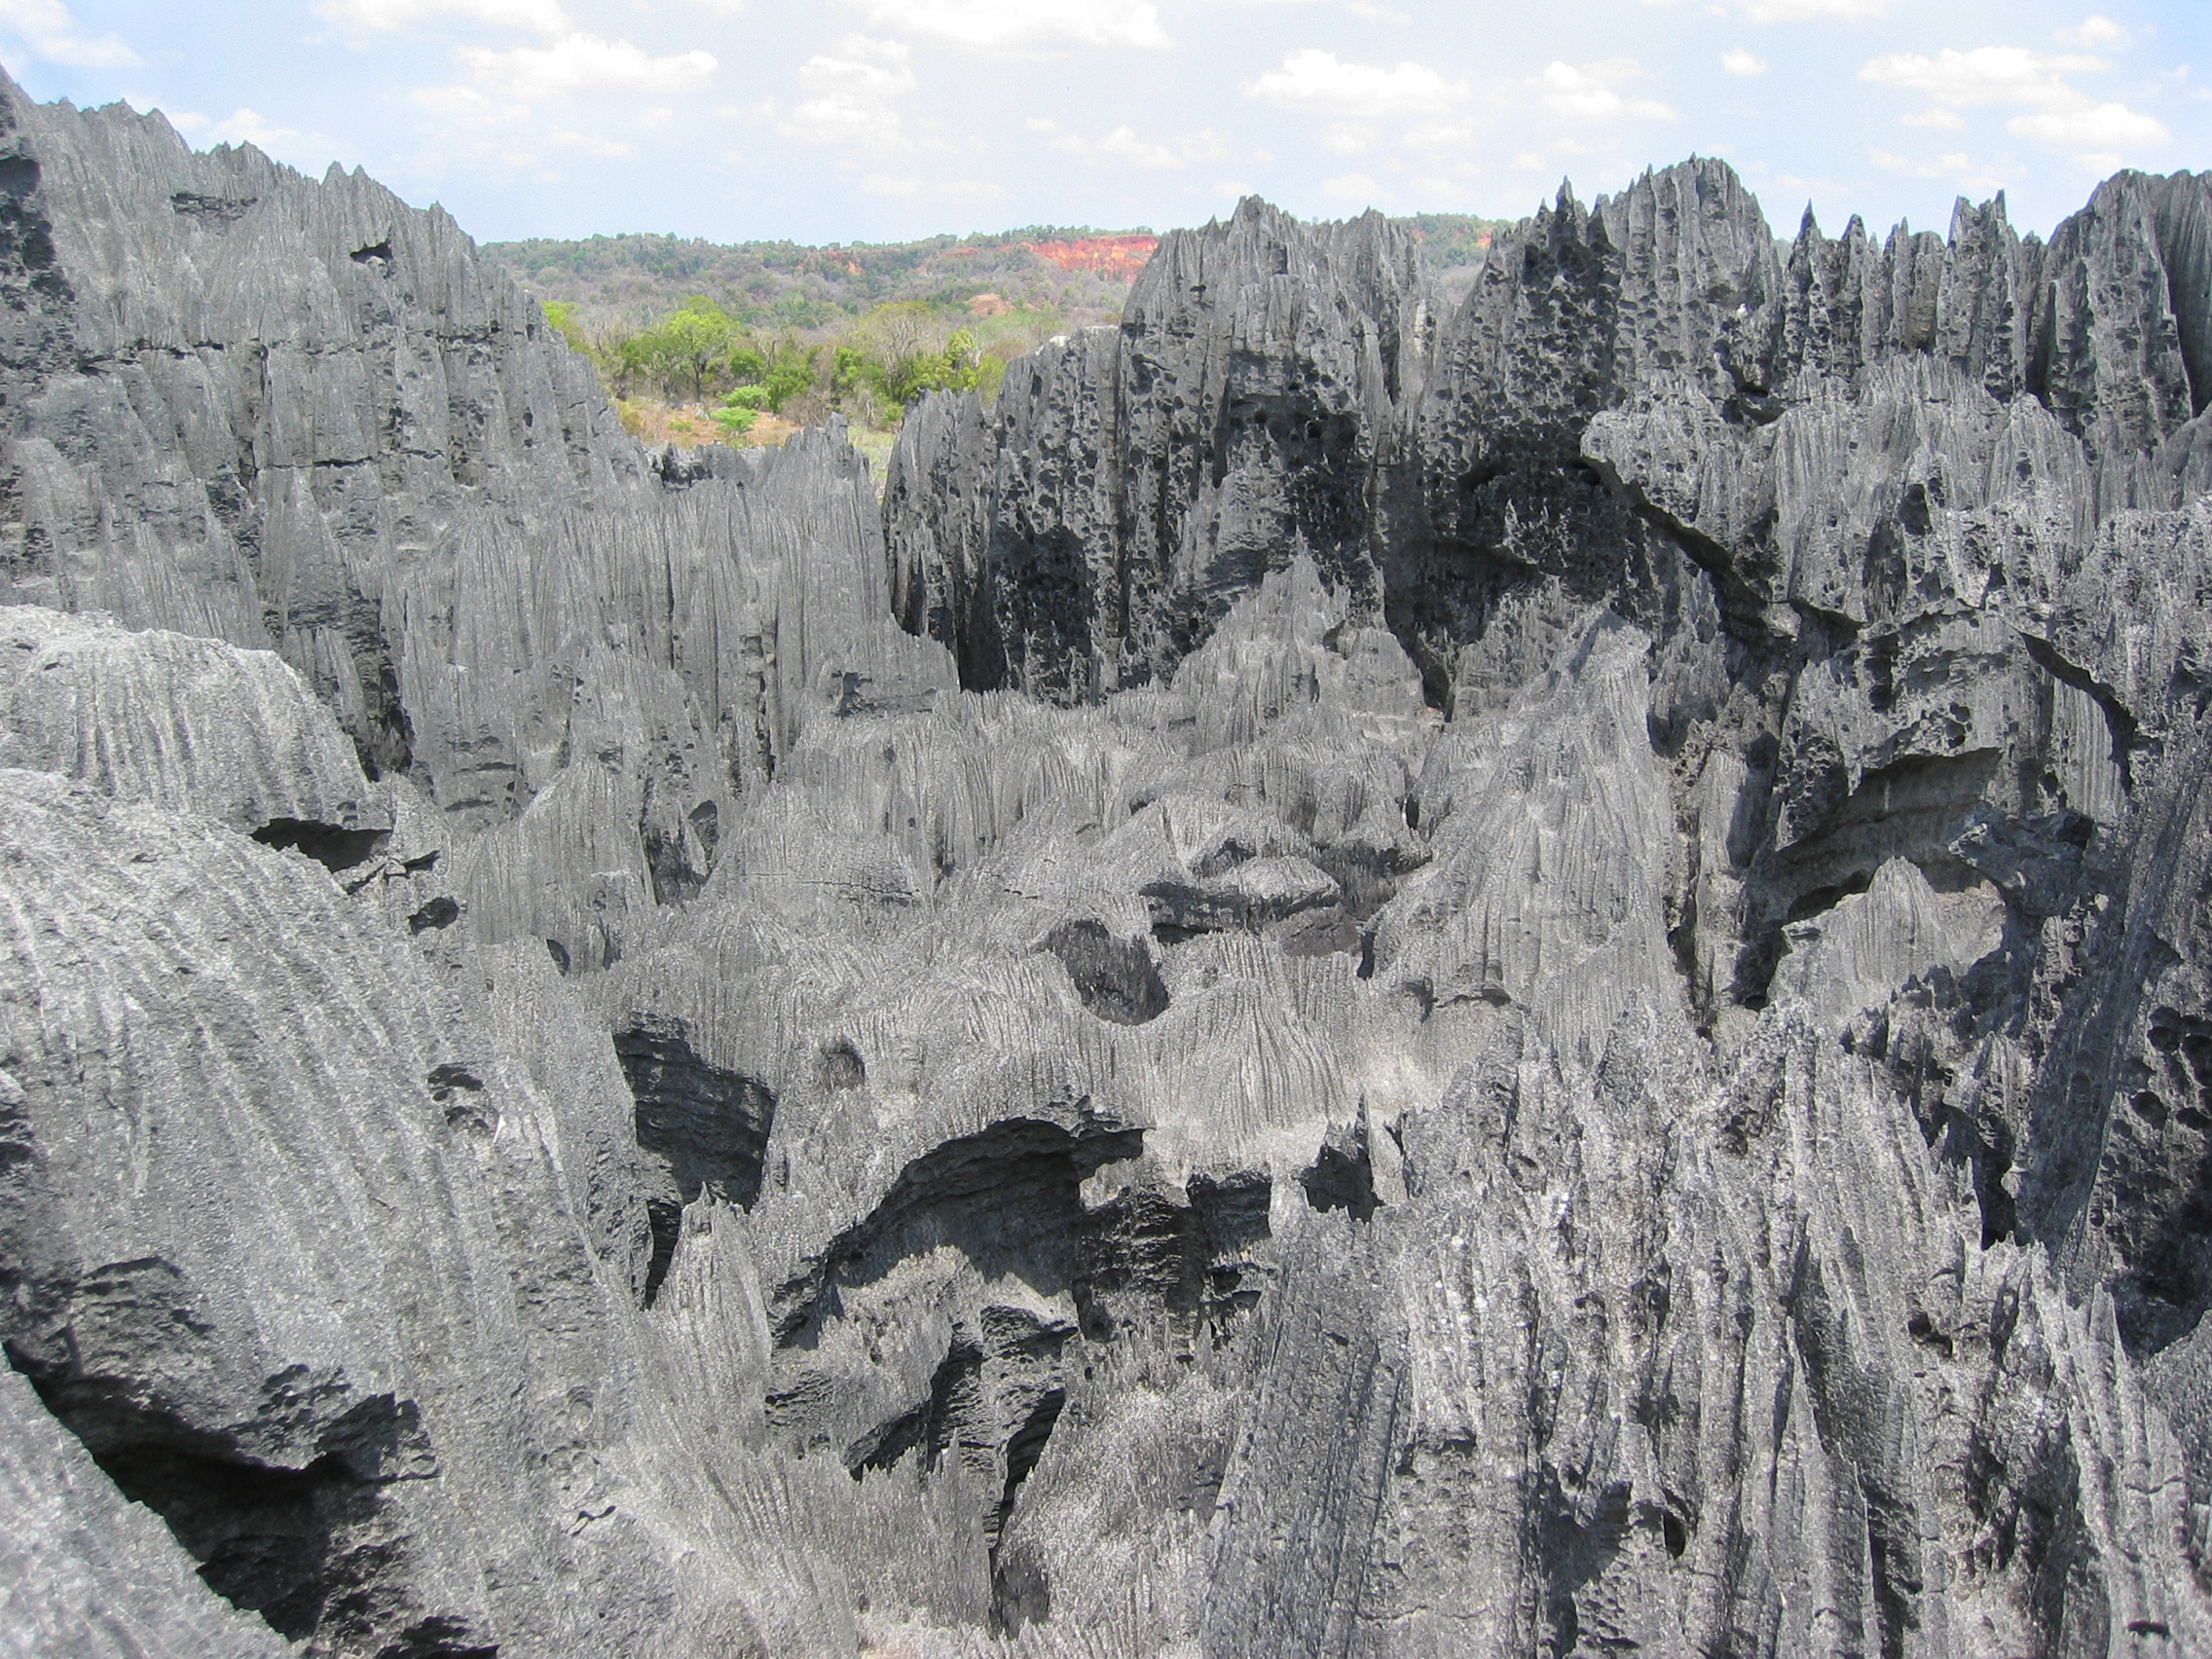 [Image: Tsingy_de_Bemaraha_Strict_Nature_Reserve.jpg]